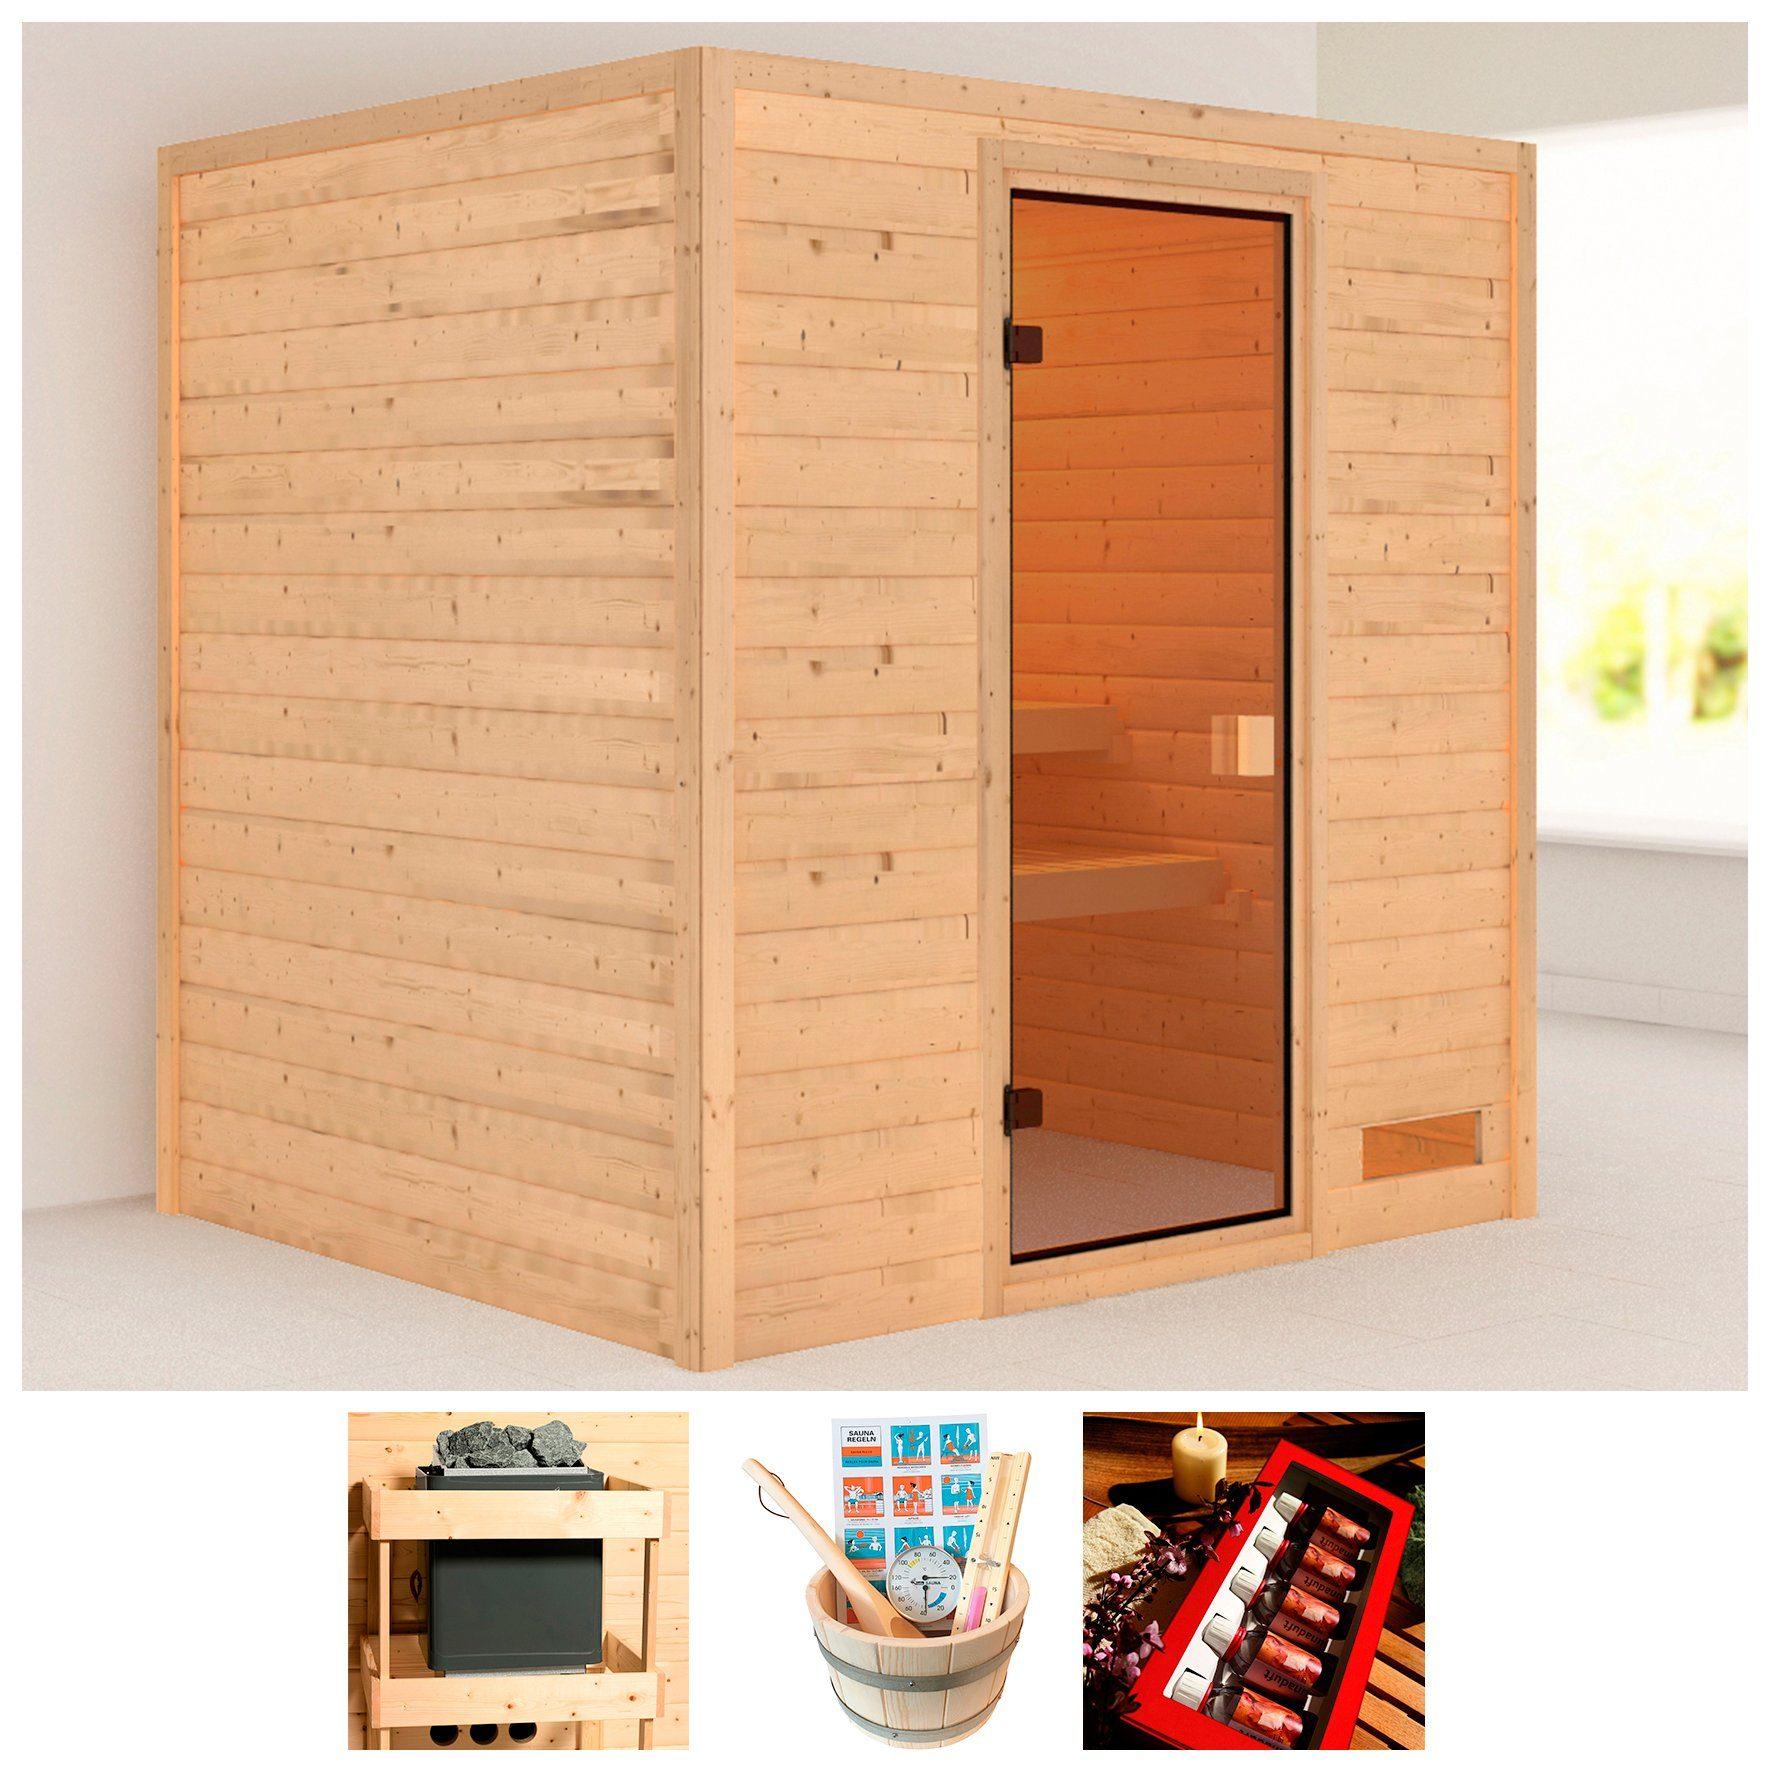 KARIBU Sauna »Wangerooge«, BxTxH: 196x170x187 cm, ohne Ofen